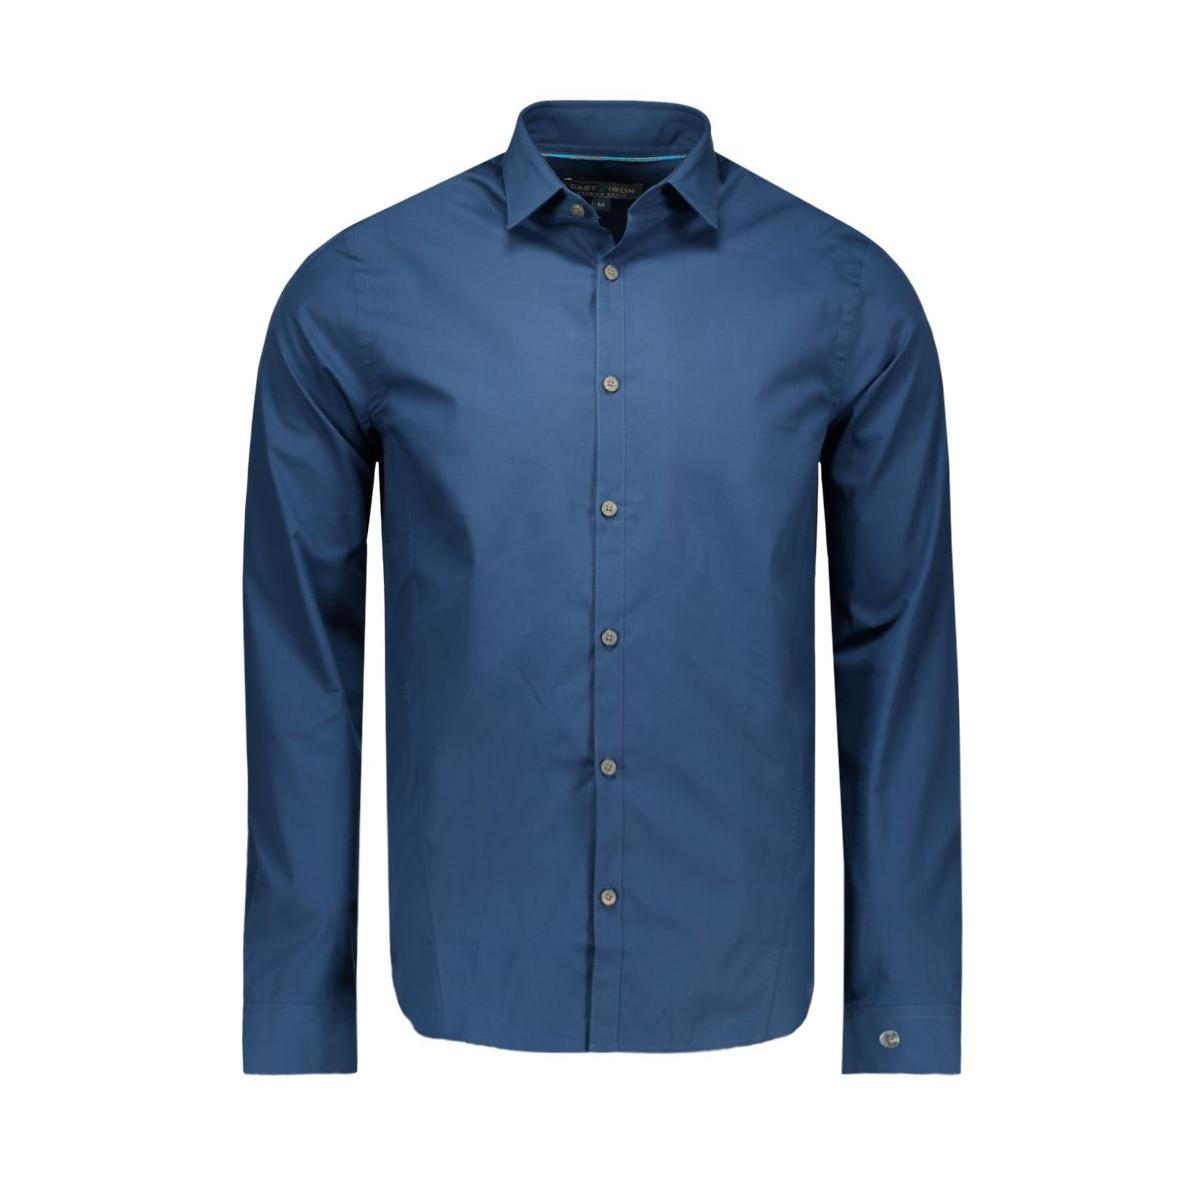 csi65690 cast iron overhemd 5955